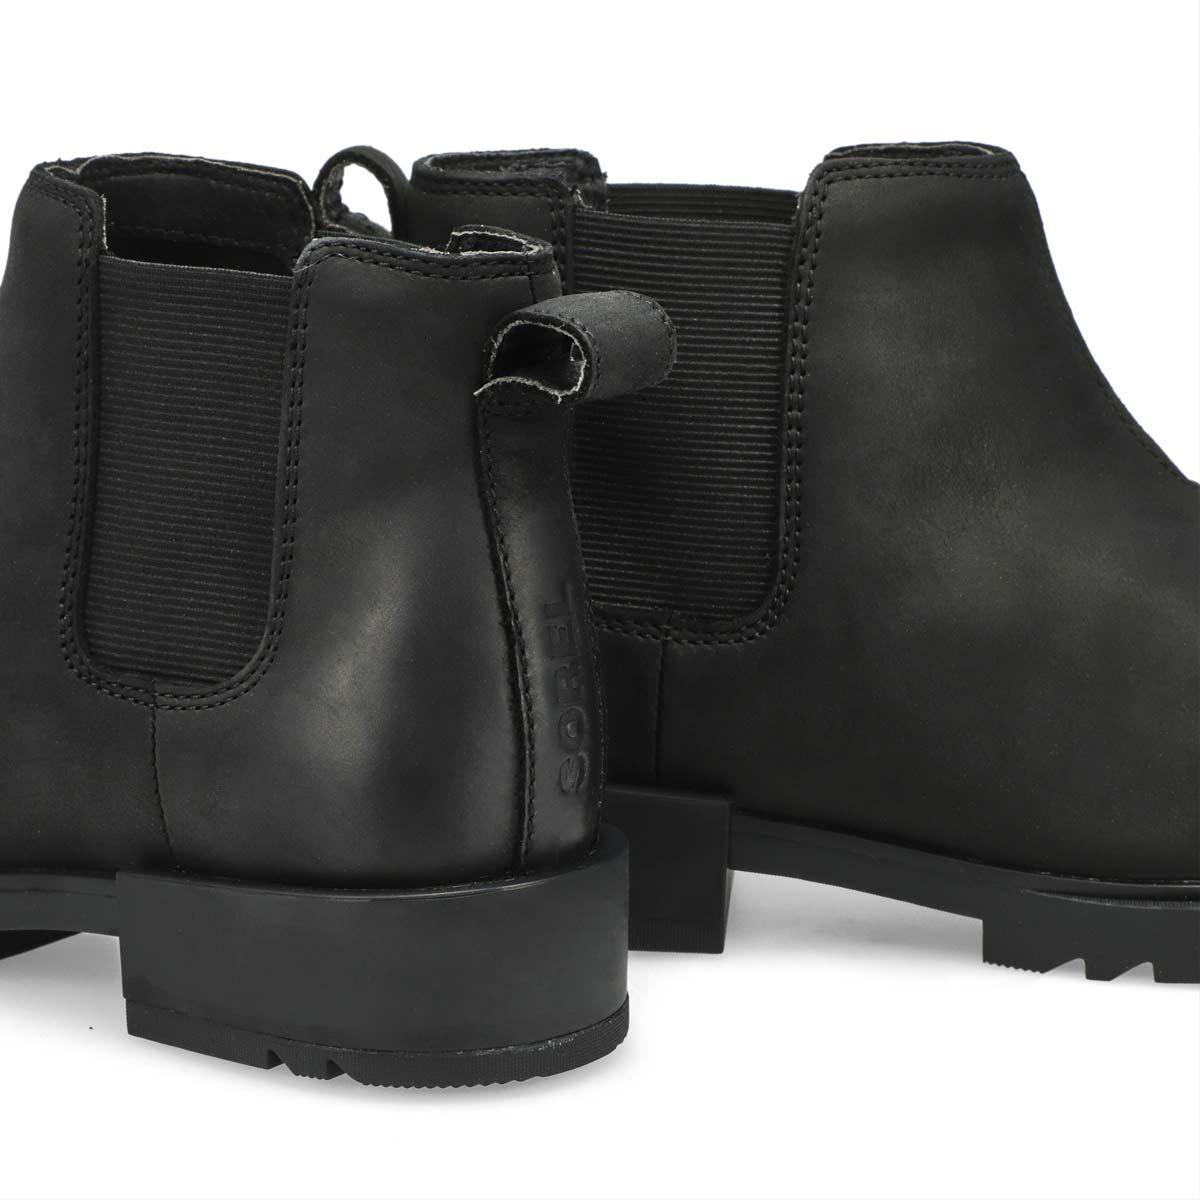 Women's Emelie II Chelsea Waterproof Boot - Black